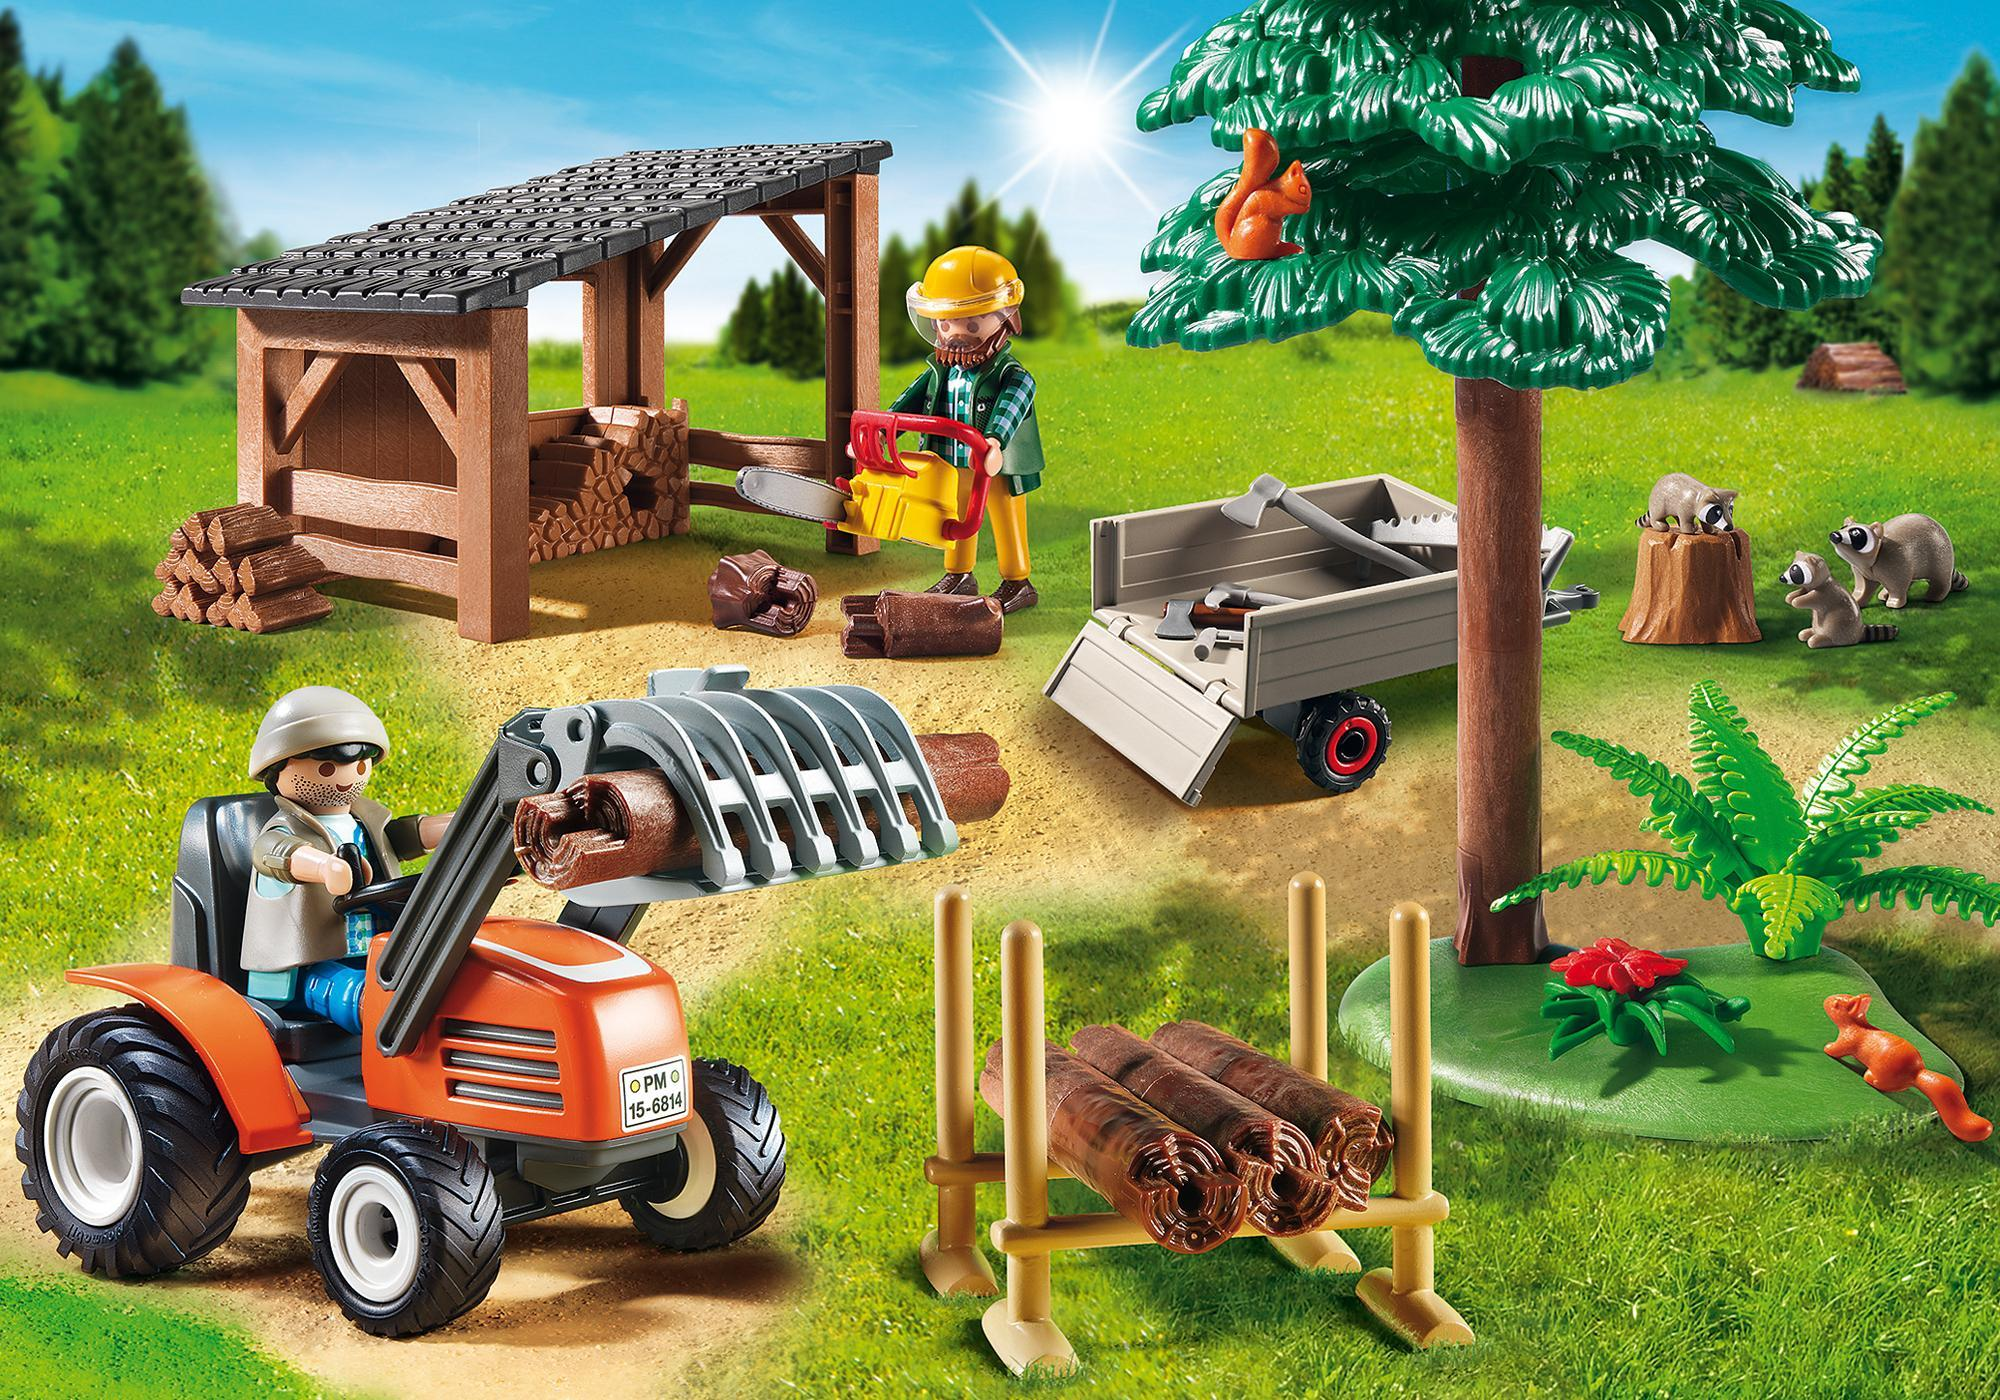 6814_product_detail/Houthakker met tractor